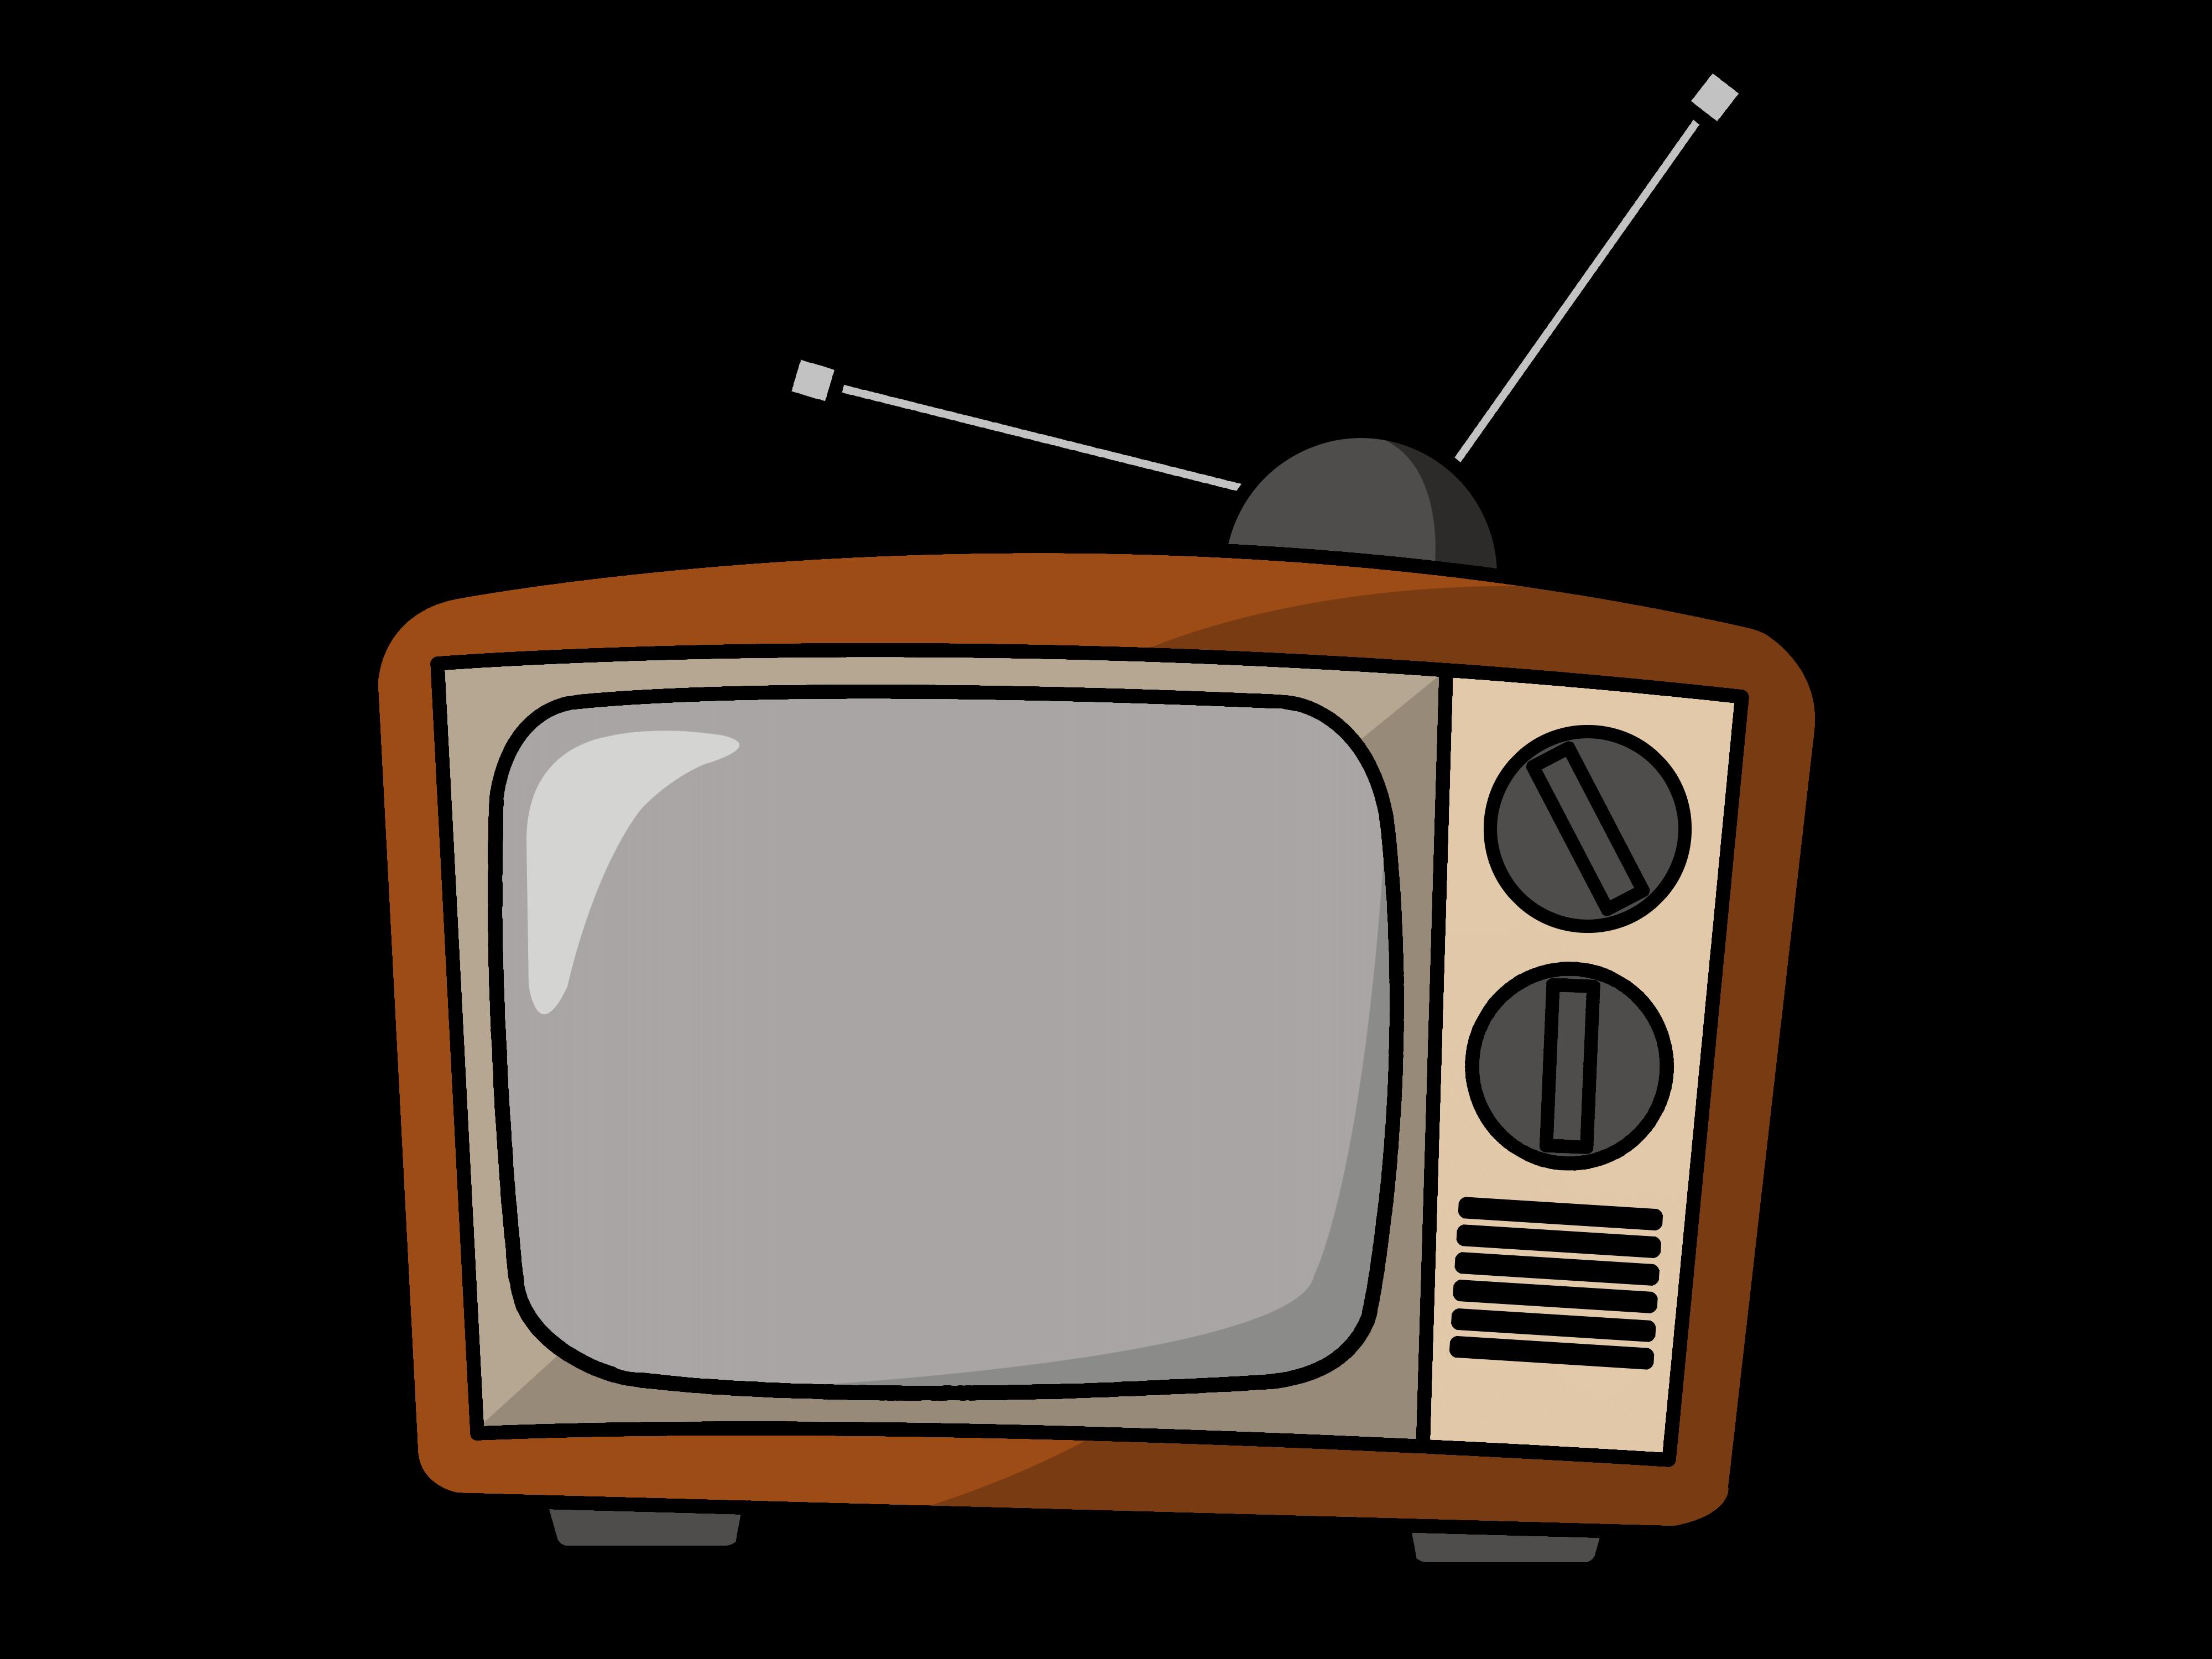 Tv Cartoon Clipart.